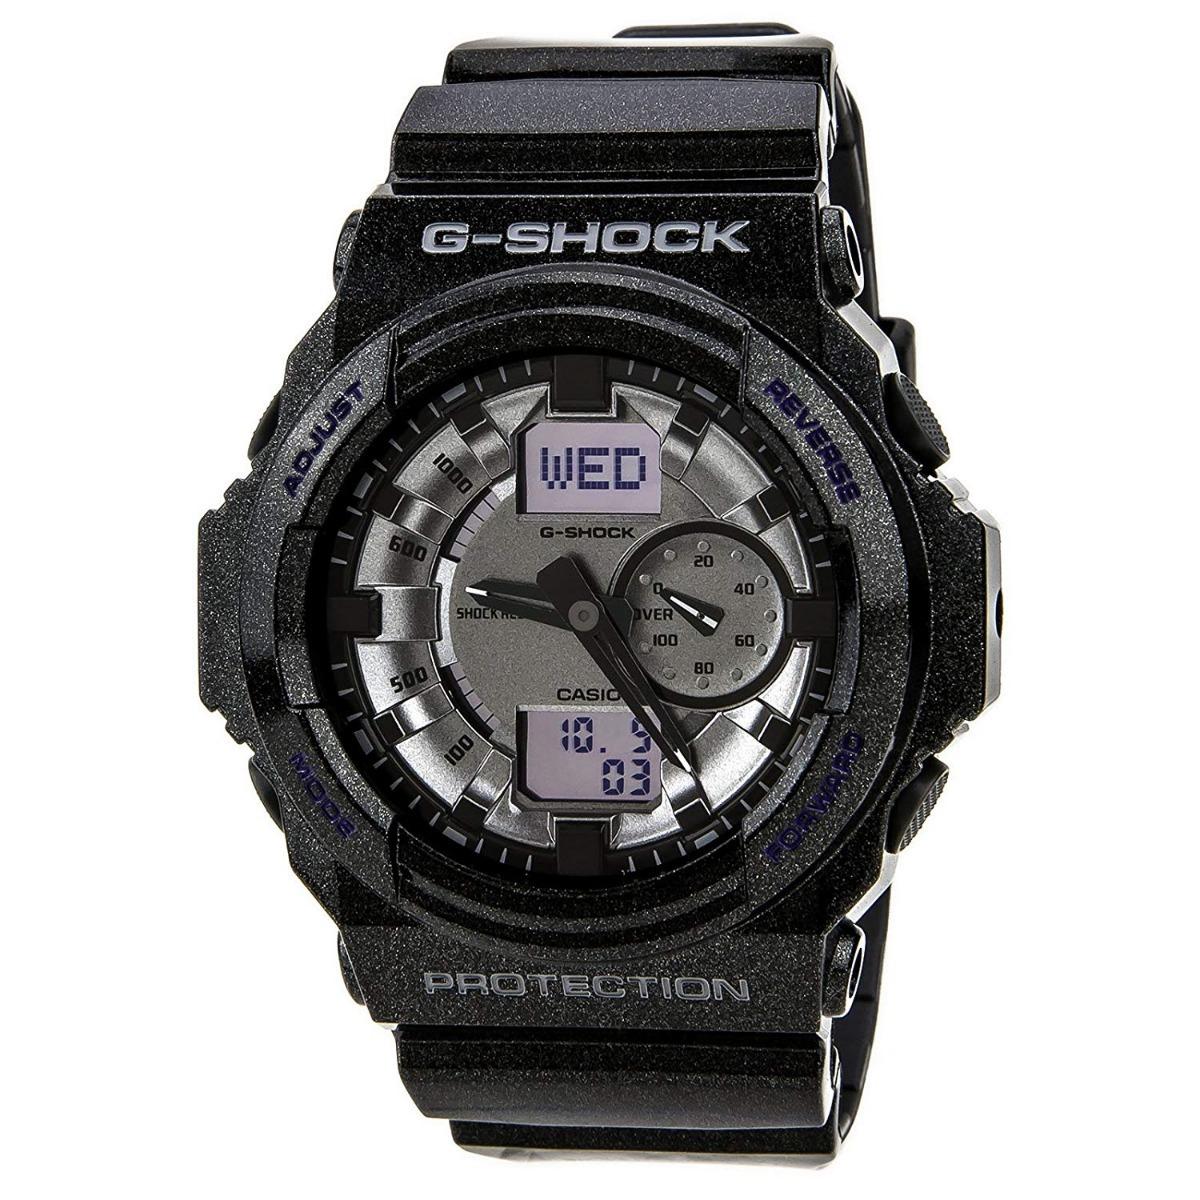 Casio Belgrano 150mf Shock Agente Oficial Reloj Ga G 8a dxoCBre